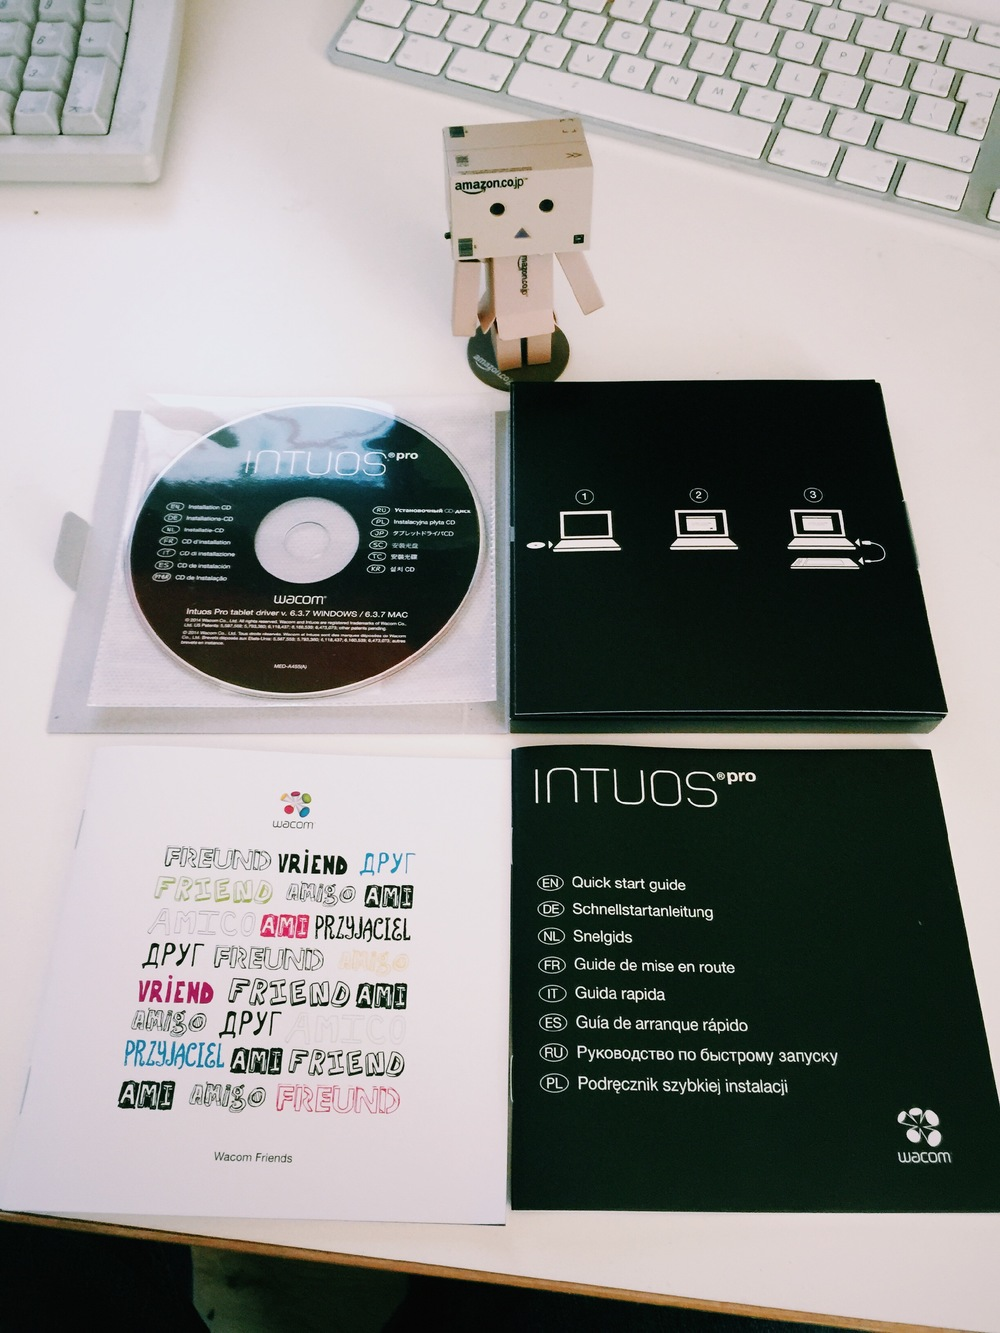 Wacom-Intuos-Unbox - 8.jpg